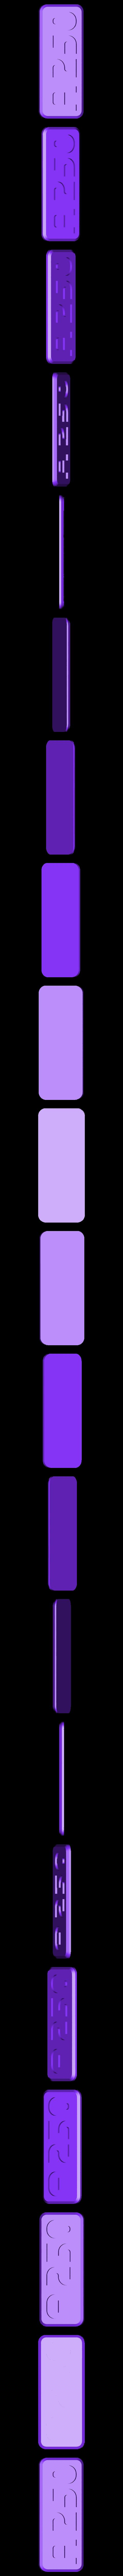 4ad7d4f4 fff5 41fb bfbe 358668797ad0